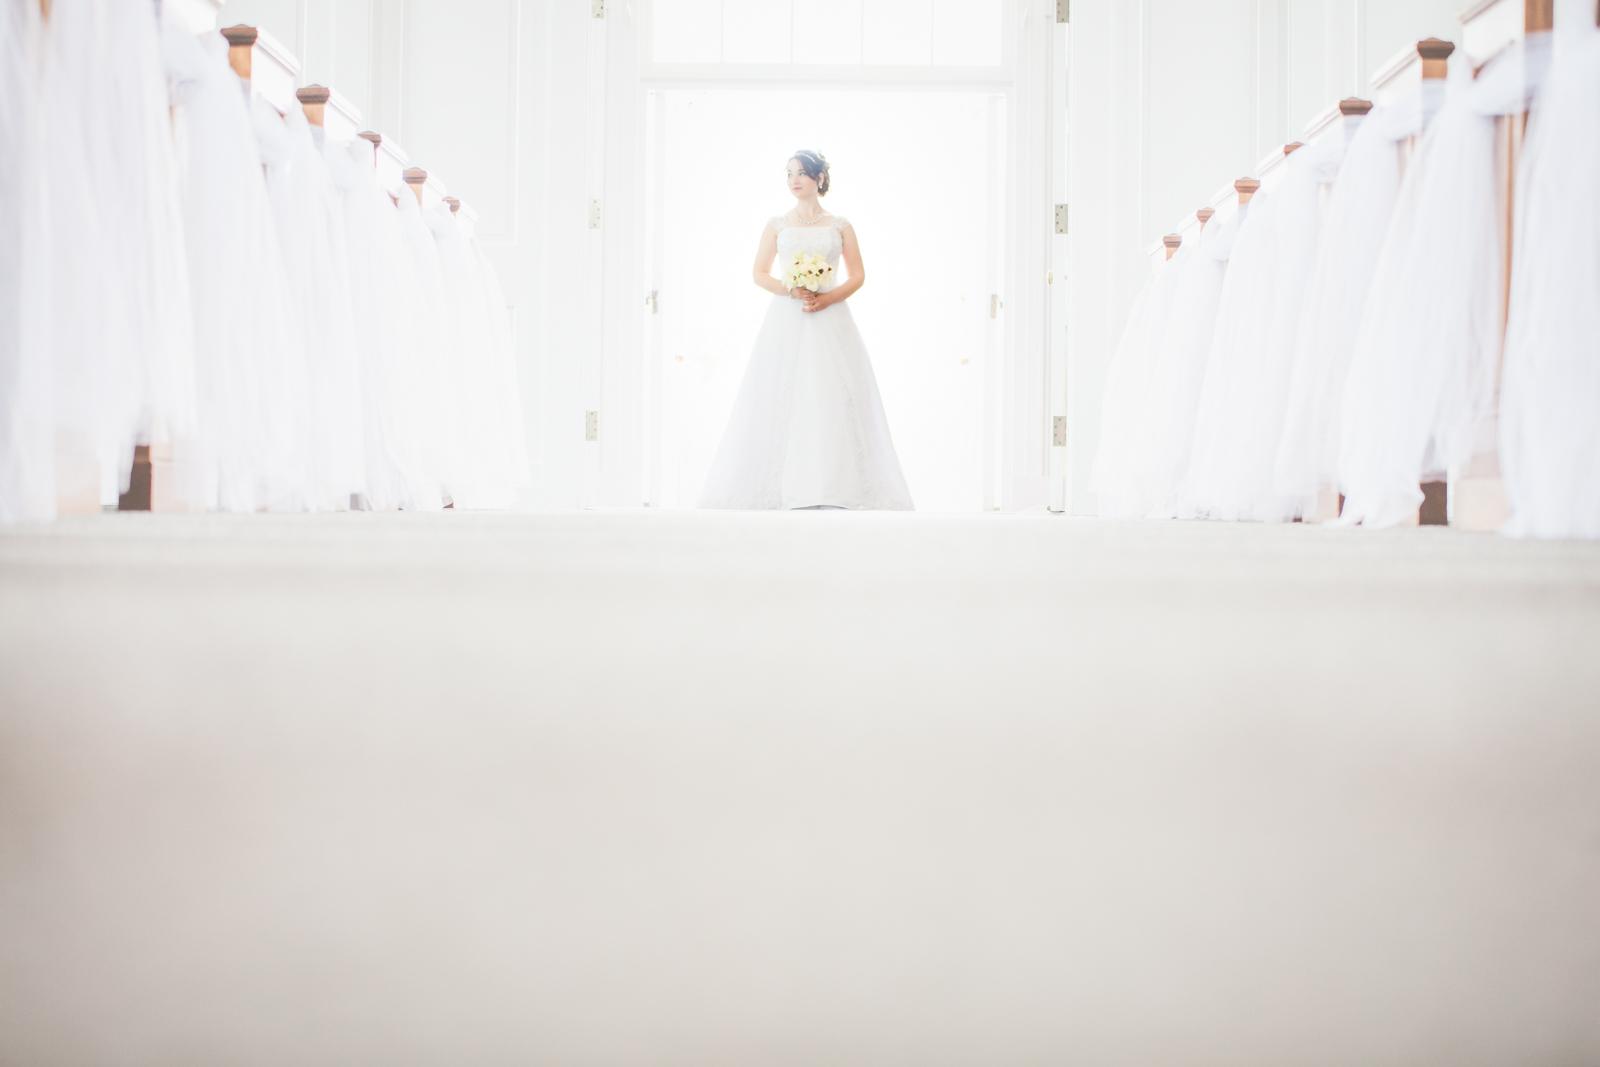 naperville-wedding-photography-44.jpg